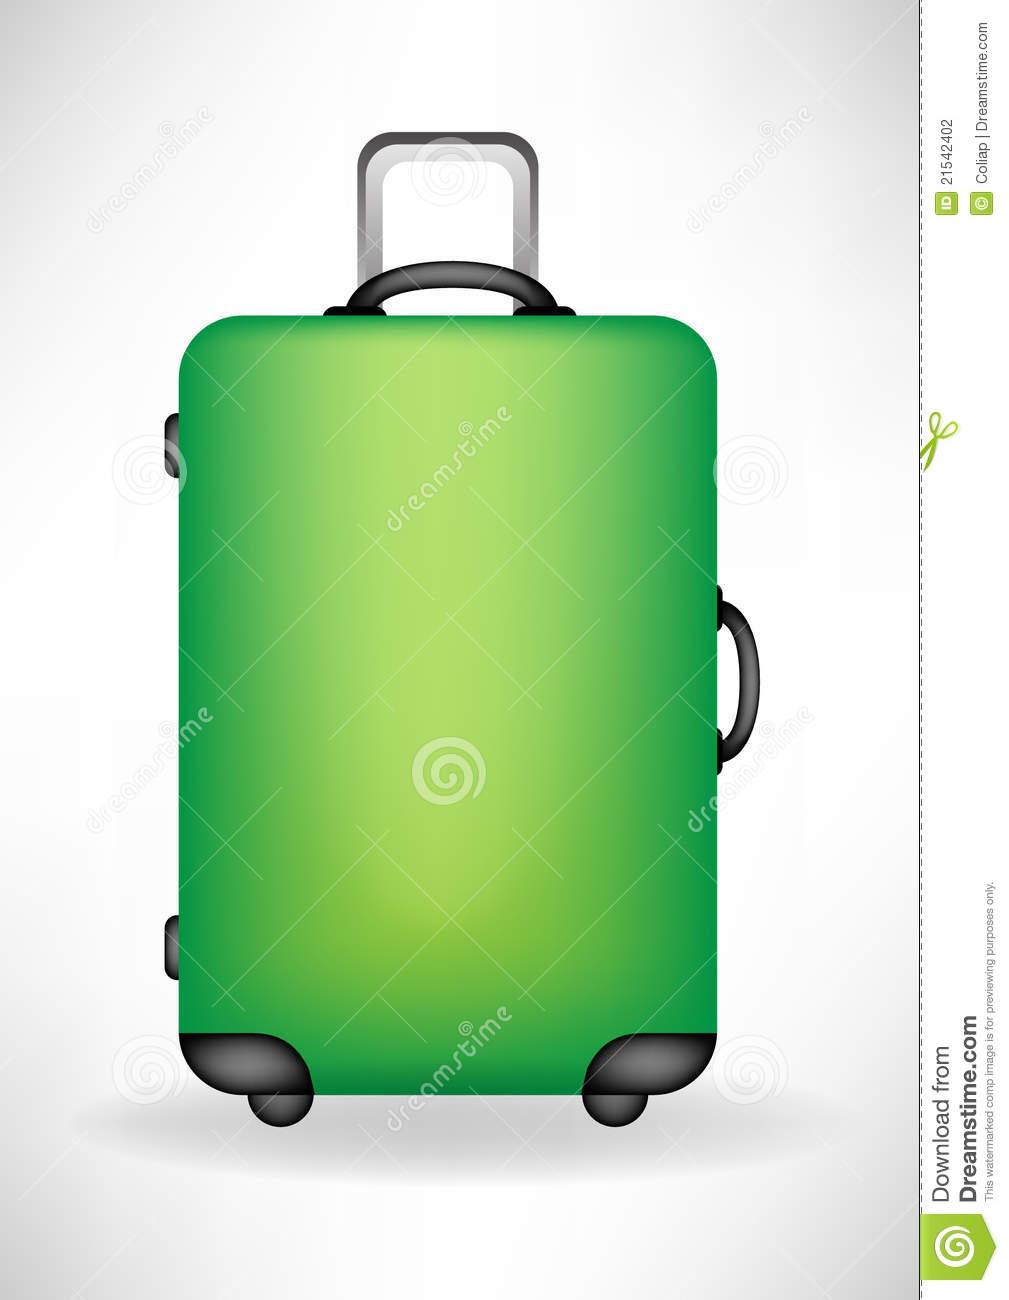 travel suitcase clip art clipart panda free clipart images rh clipartpanda com clipart suitcase free clipart suitcase images